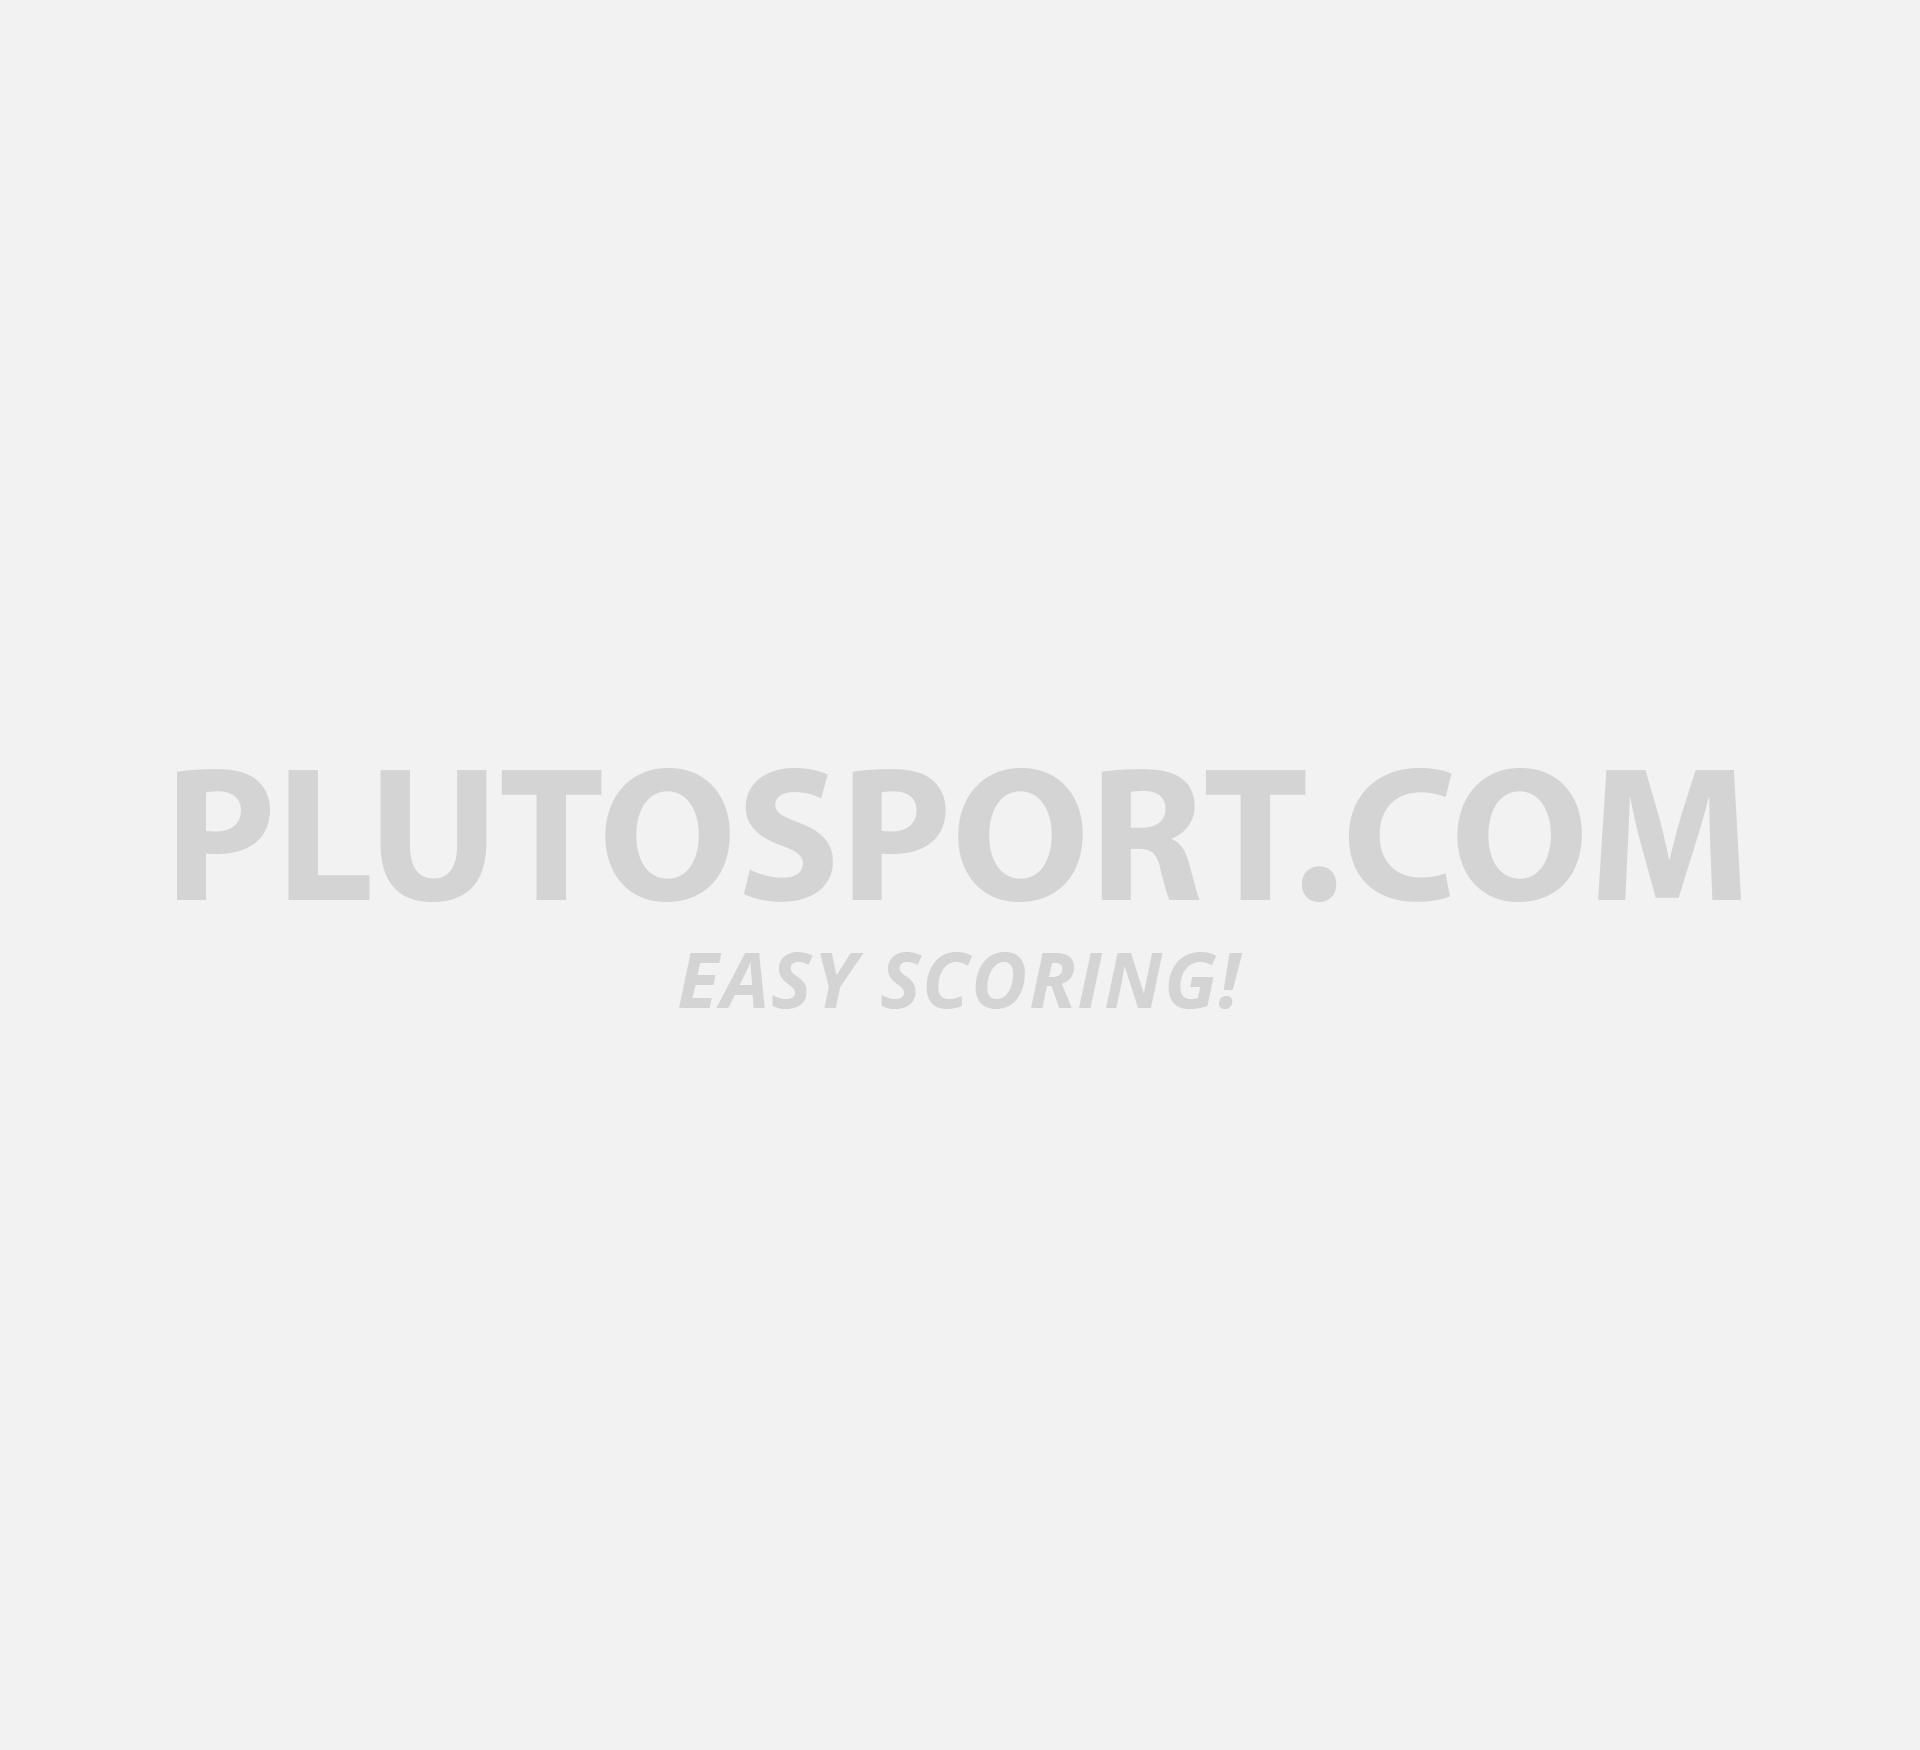 Puma Fundamentals Sports Bag S - Without shoe compartment - Bags ... 9f10725c44b6c